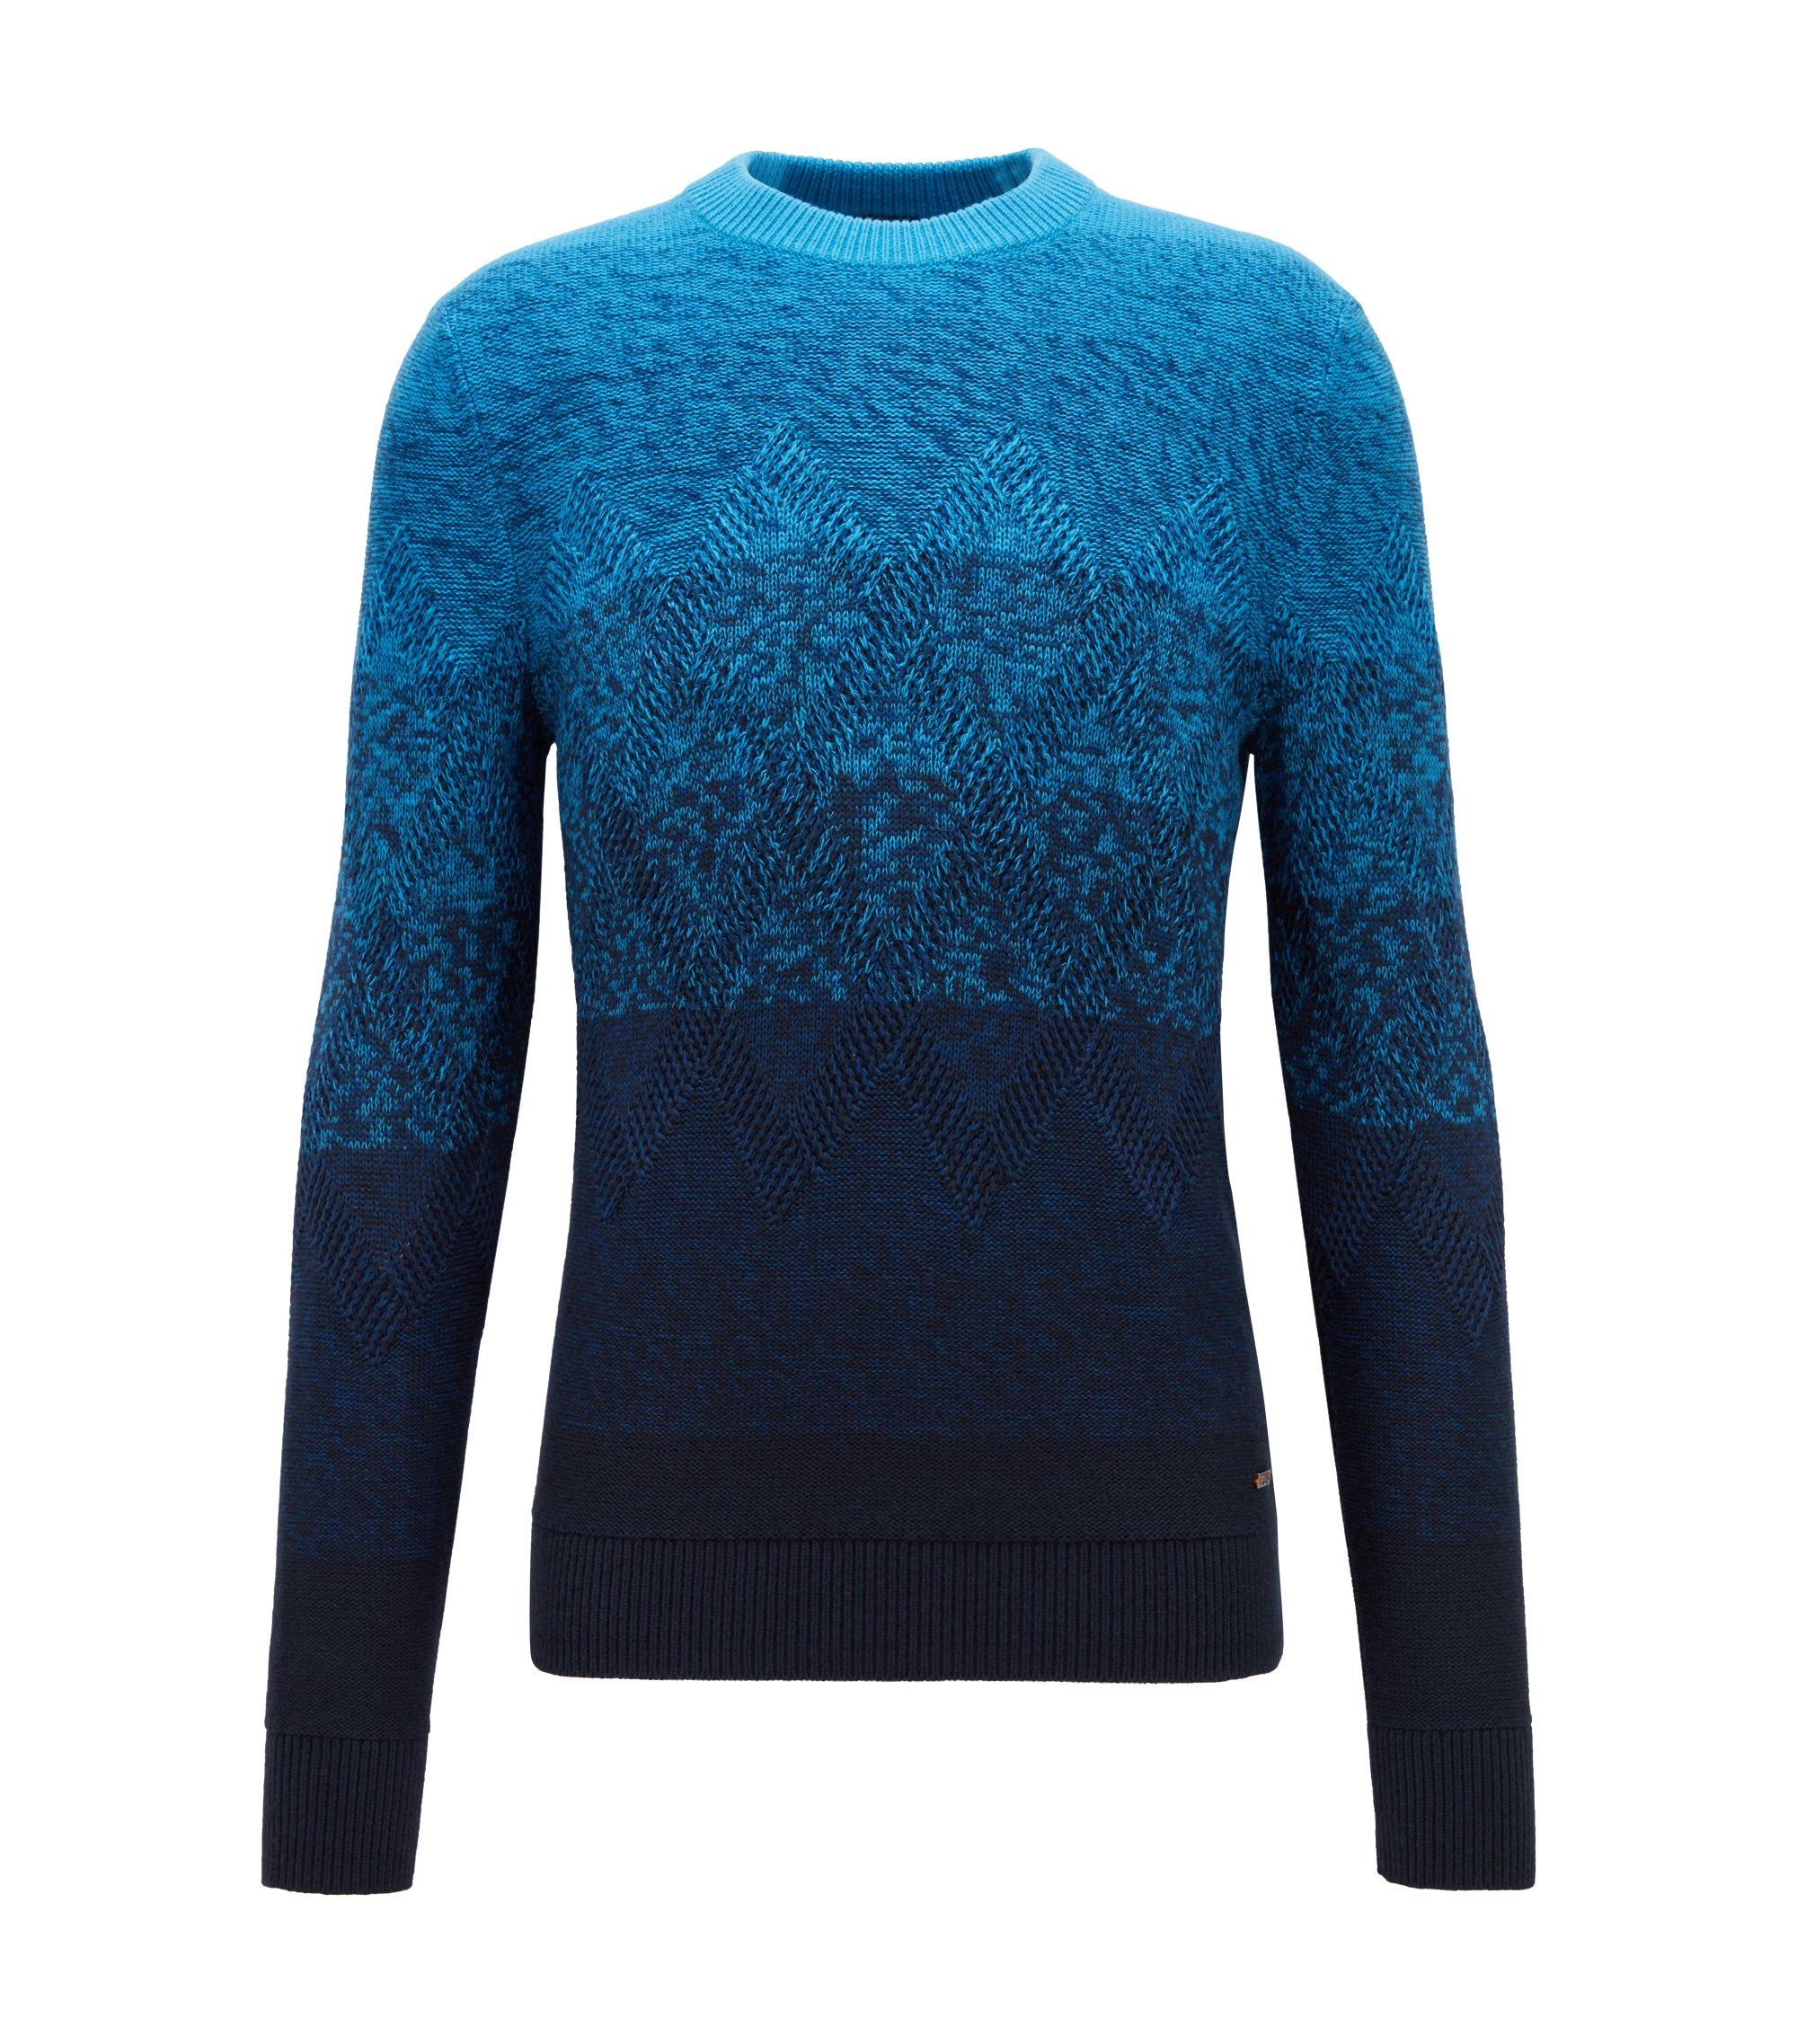 Dégradé sweater with Aran-knit detailing, Dark Blue